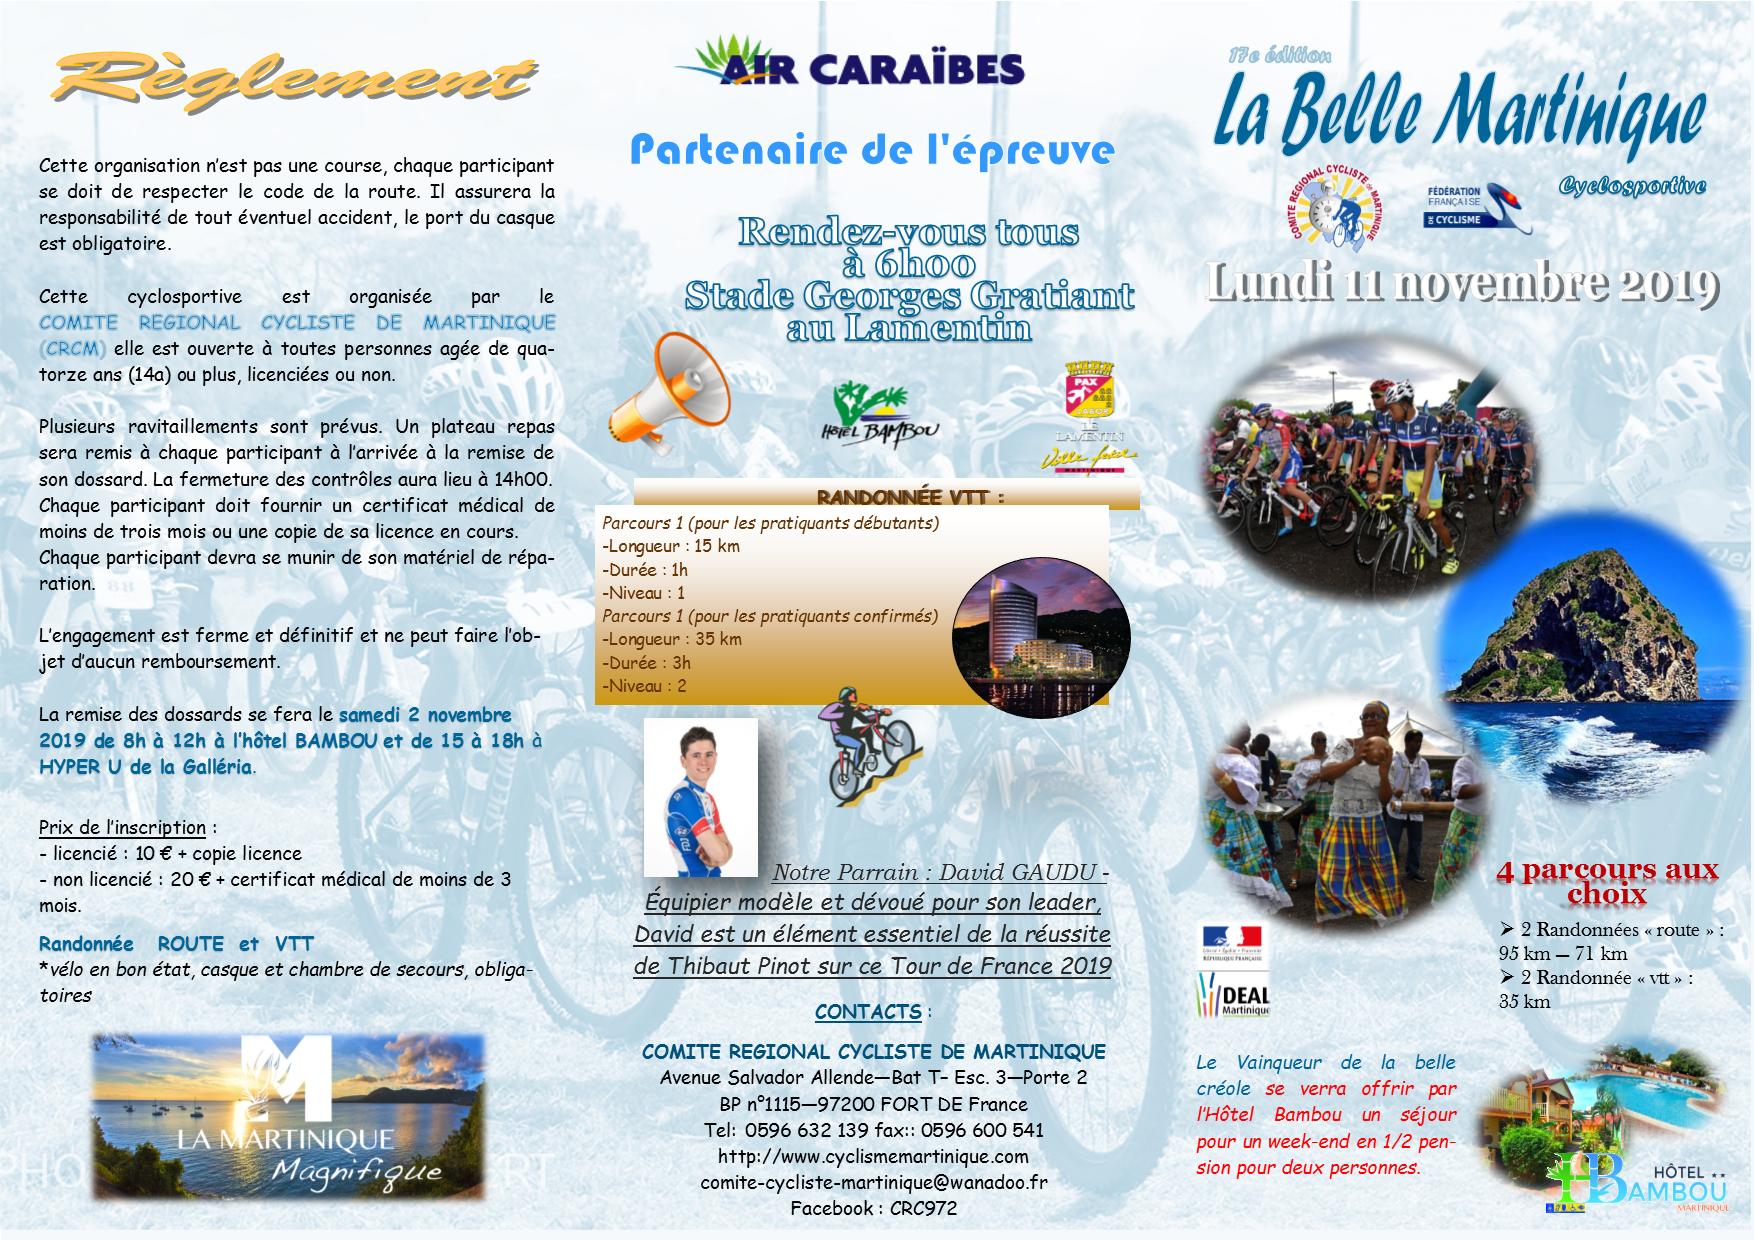 Belle Martinique 2019 brochure 2